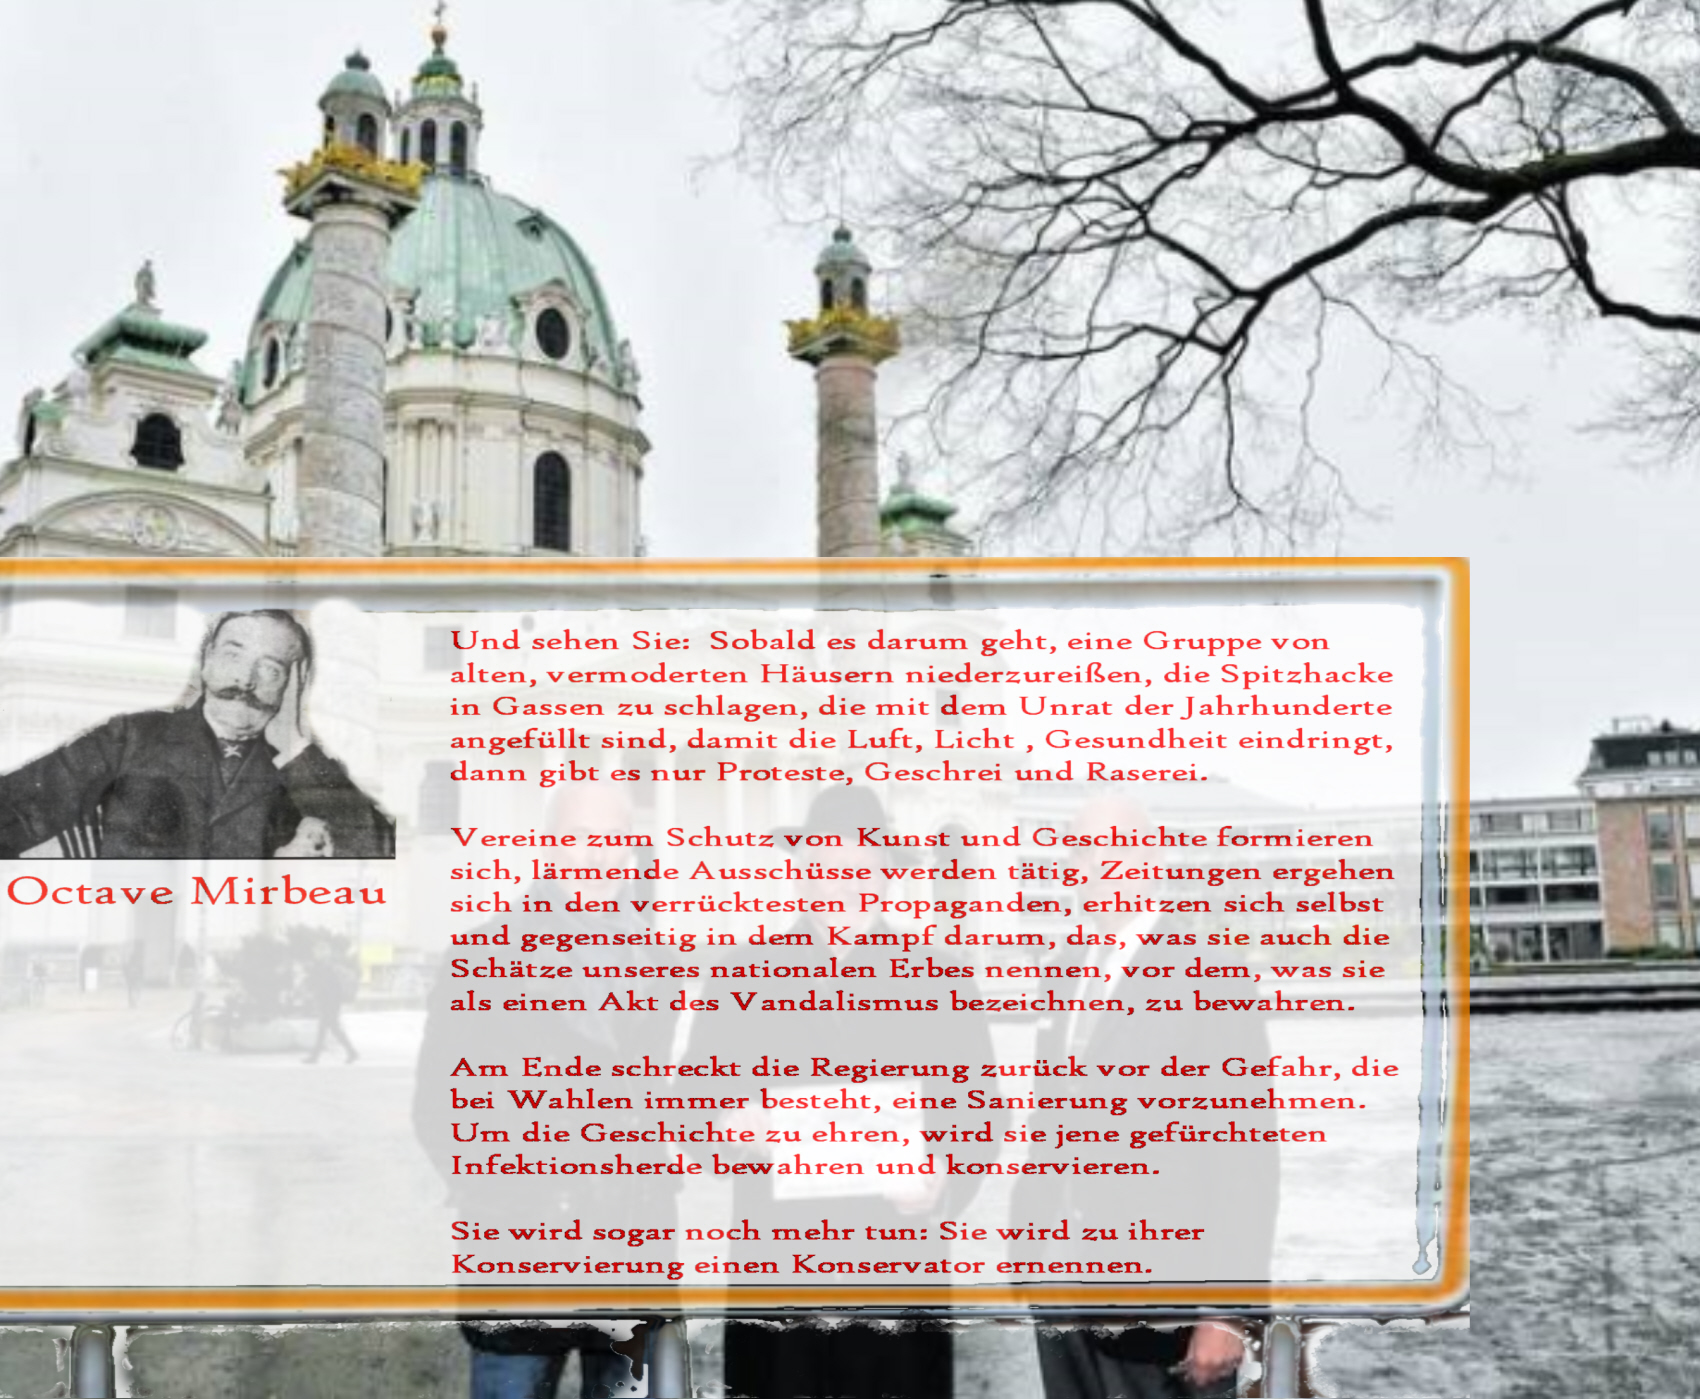 Rettet die Karlskirche - Weltkulturerbe